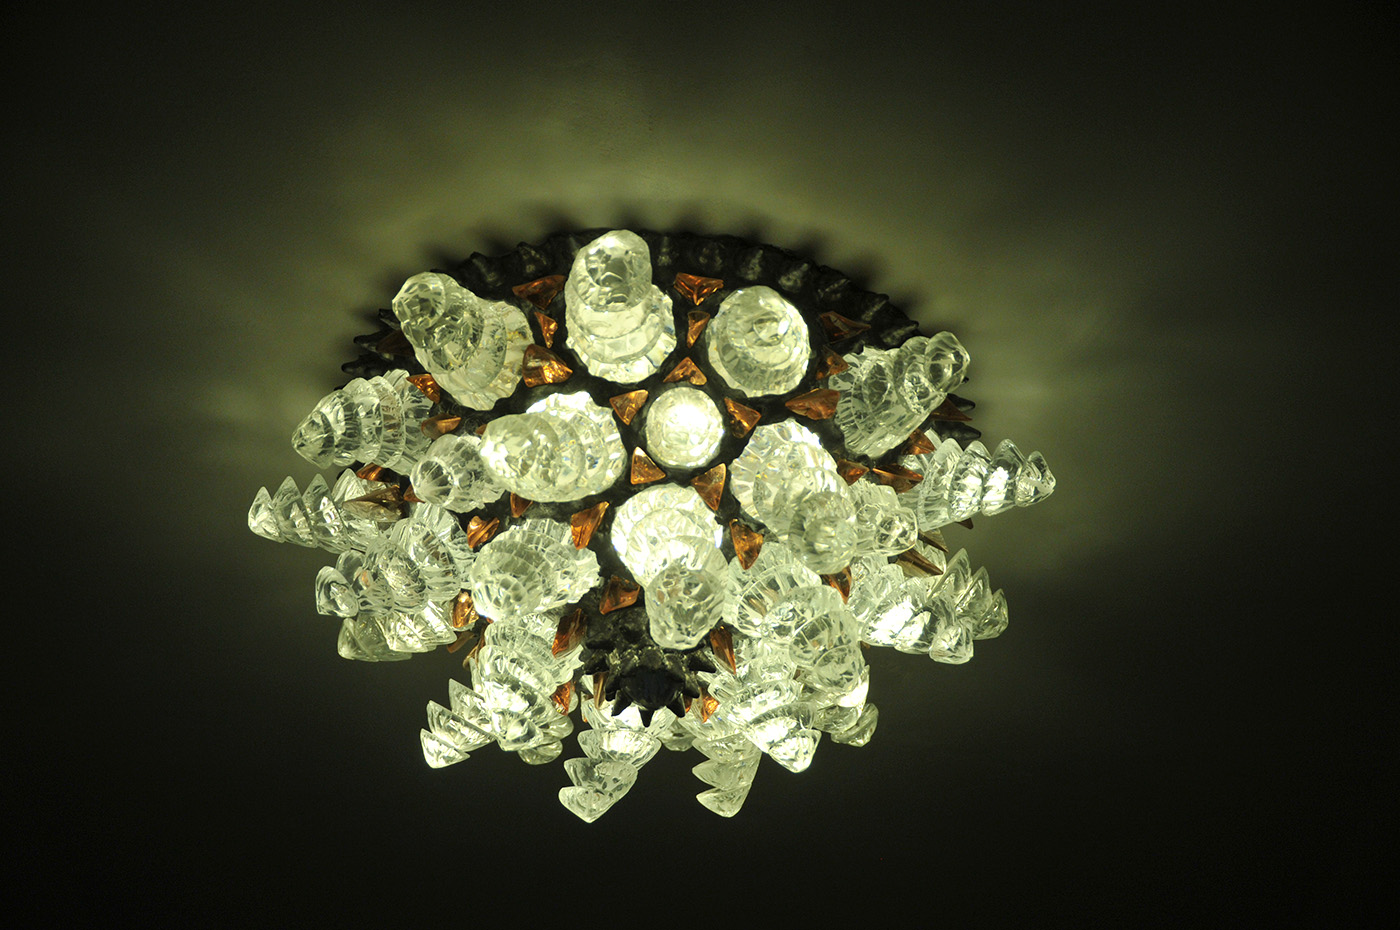 anemone-soffitto-1